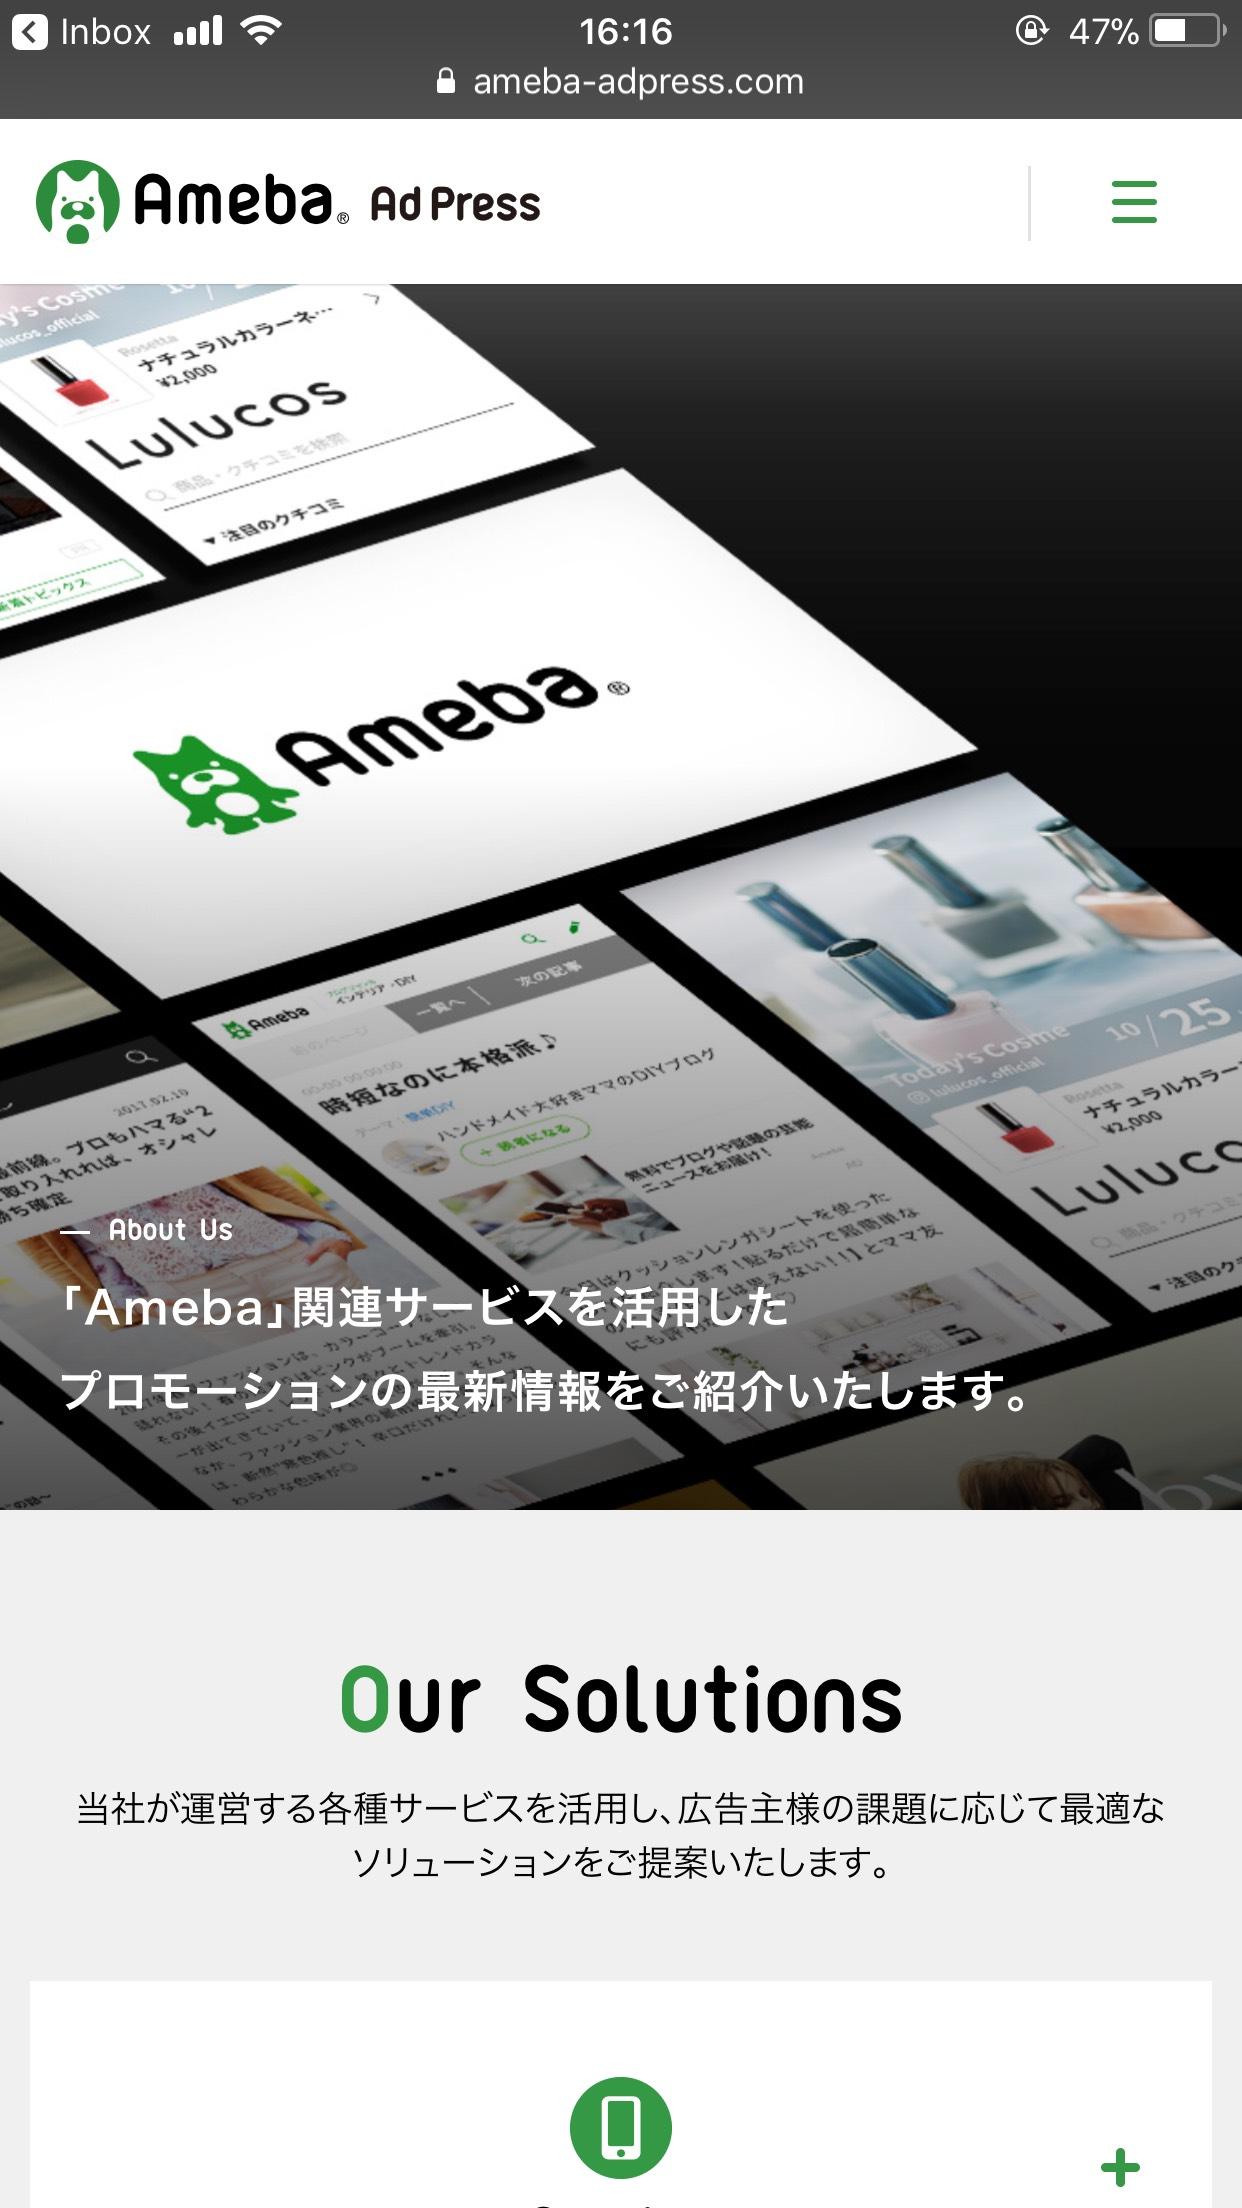 Ameba Ad Press | Ameba Ad Press